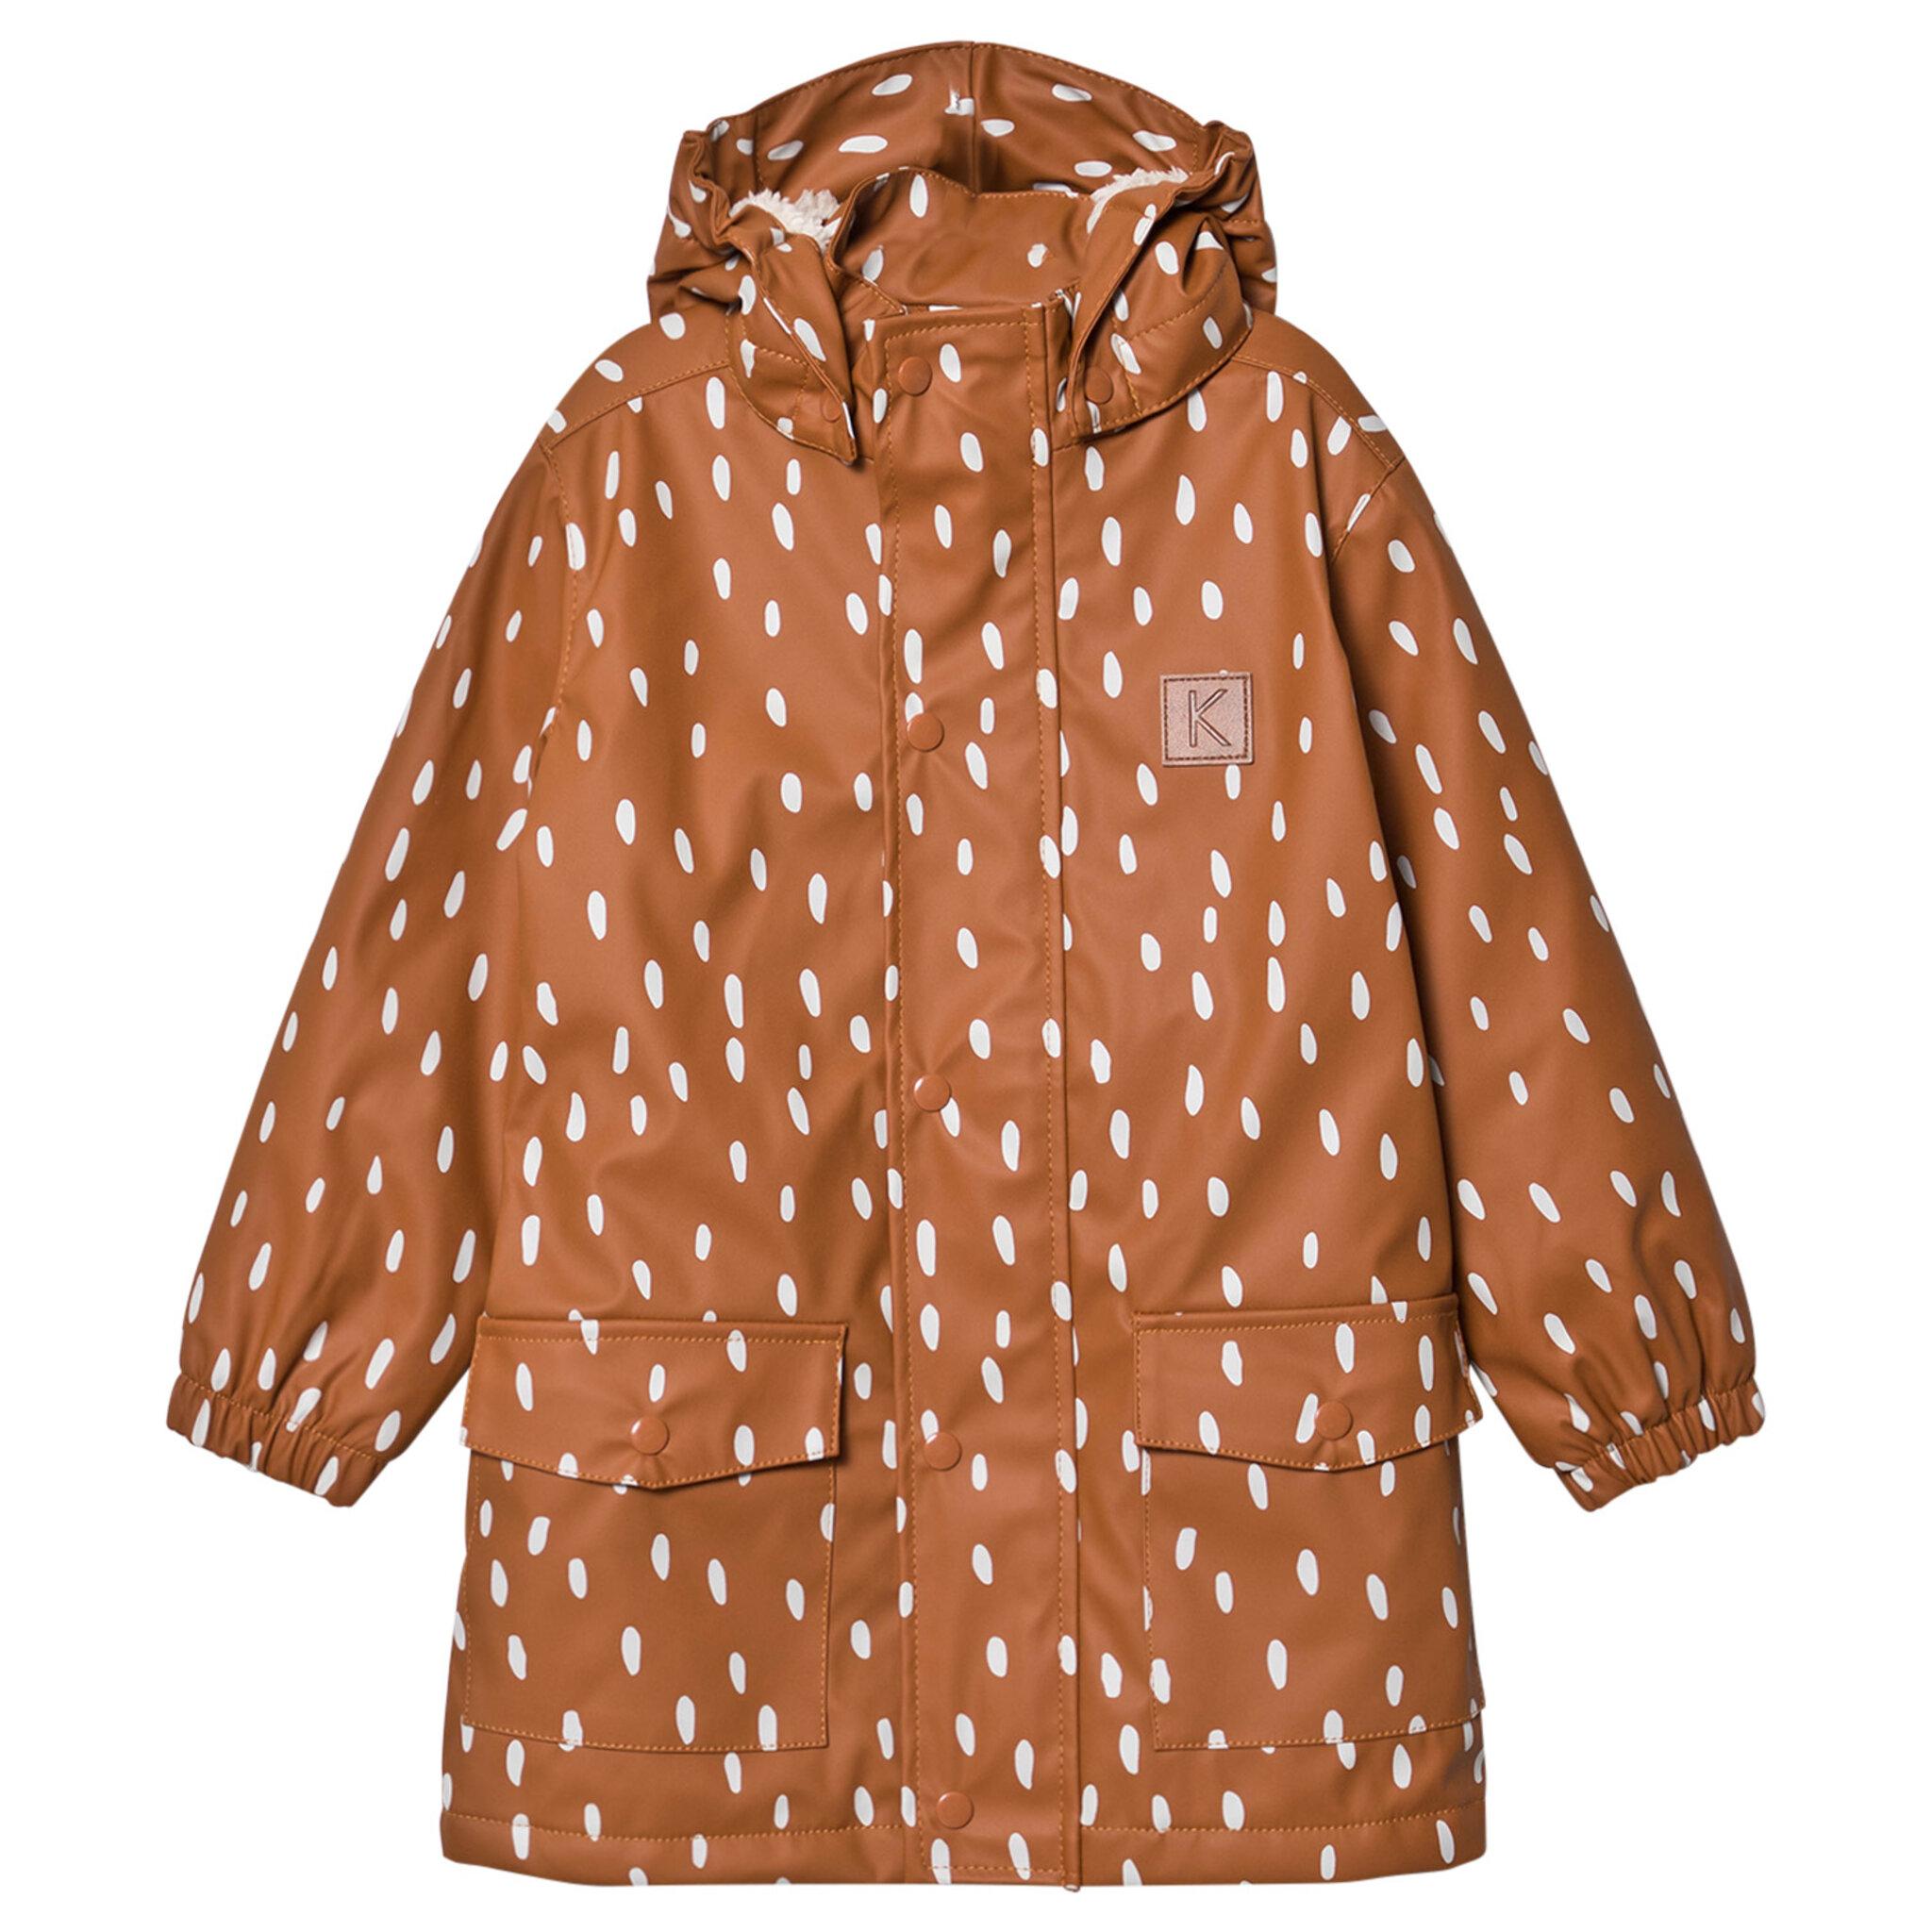 Girwood Recycled Rain Coat